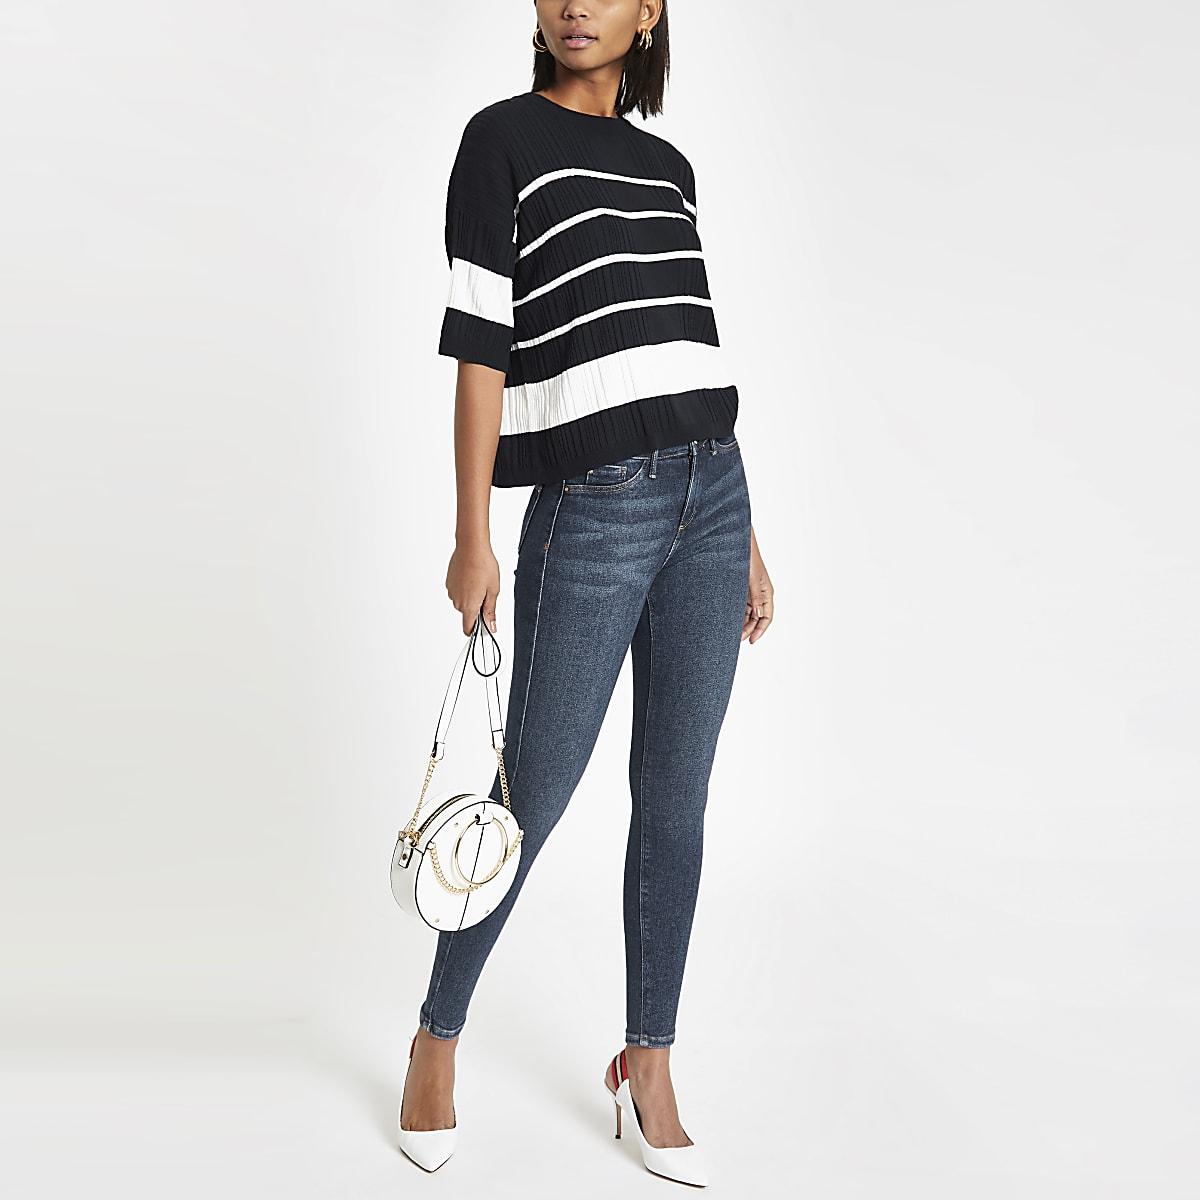 Navy oversized stripe top